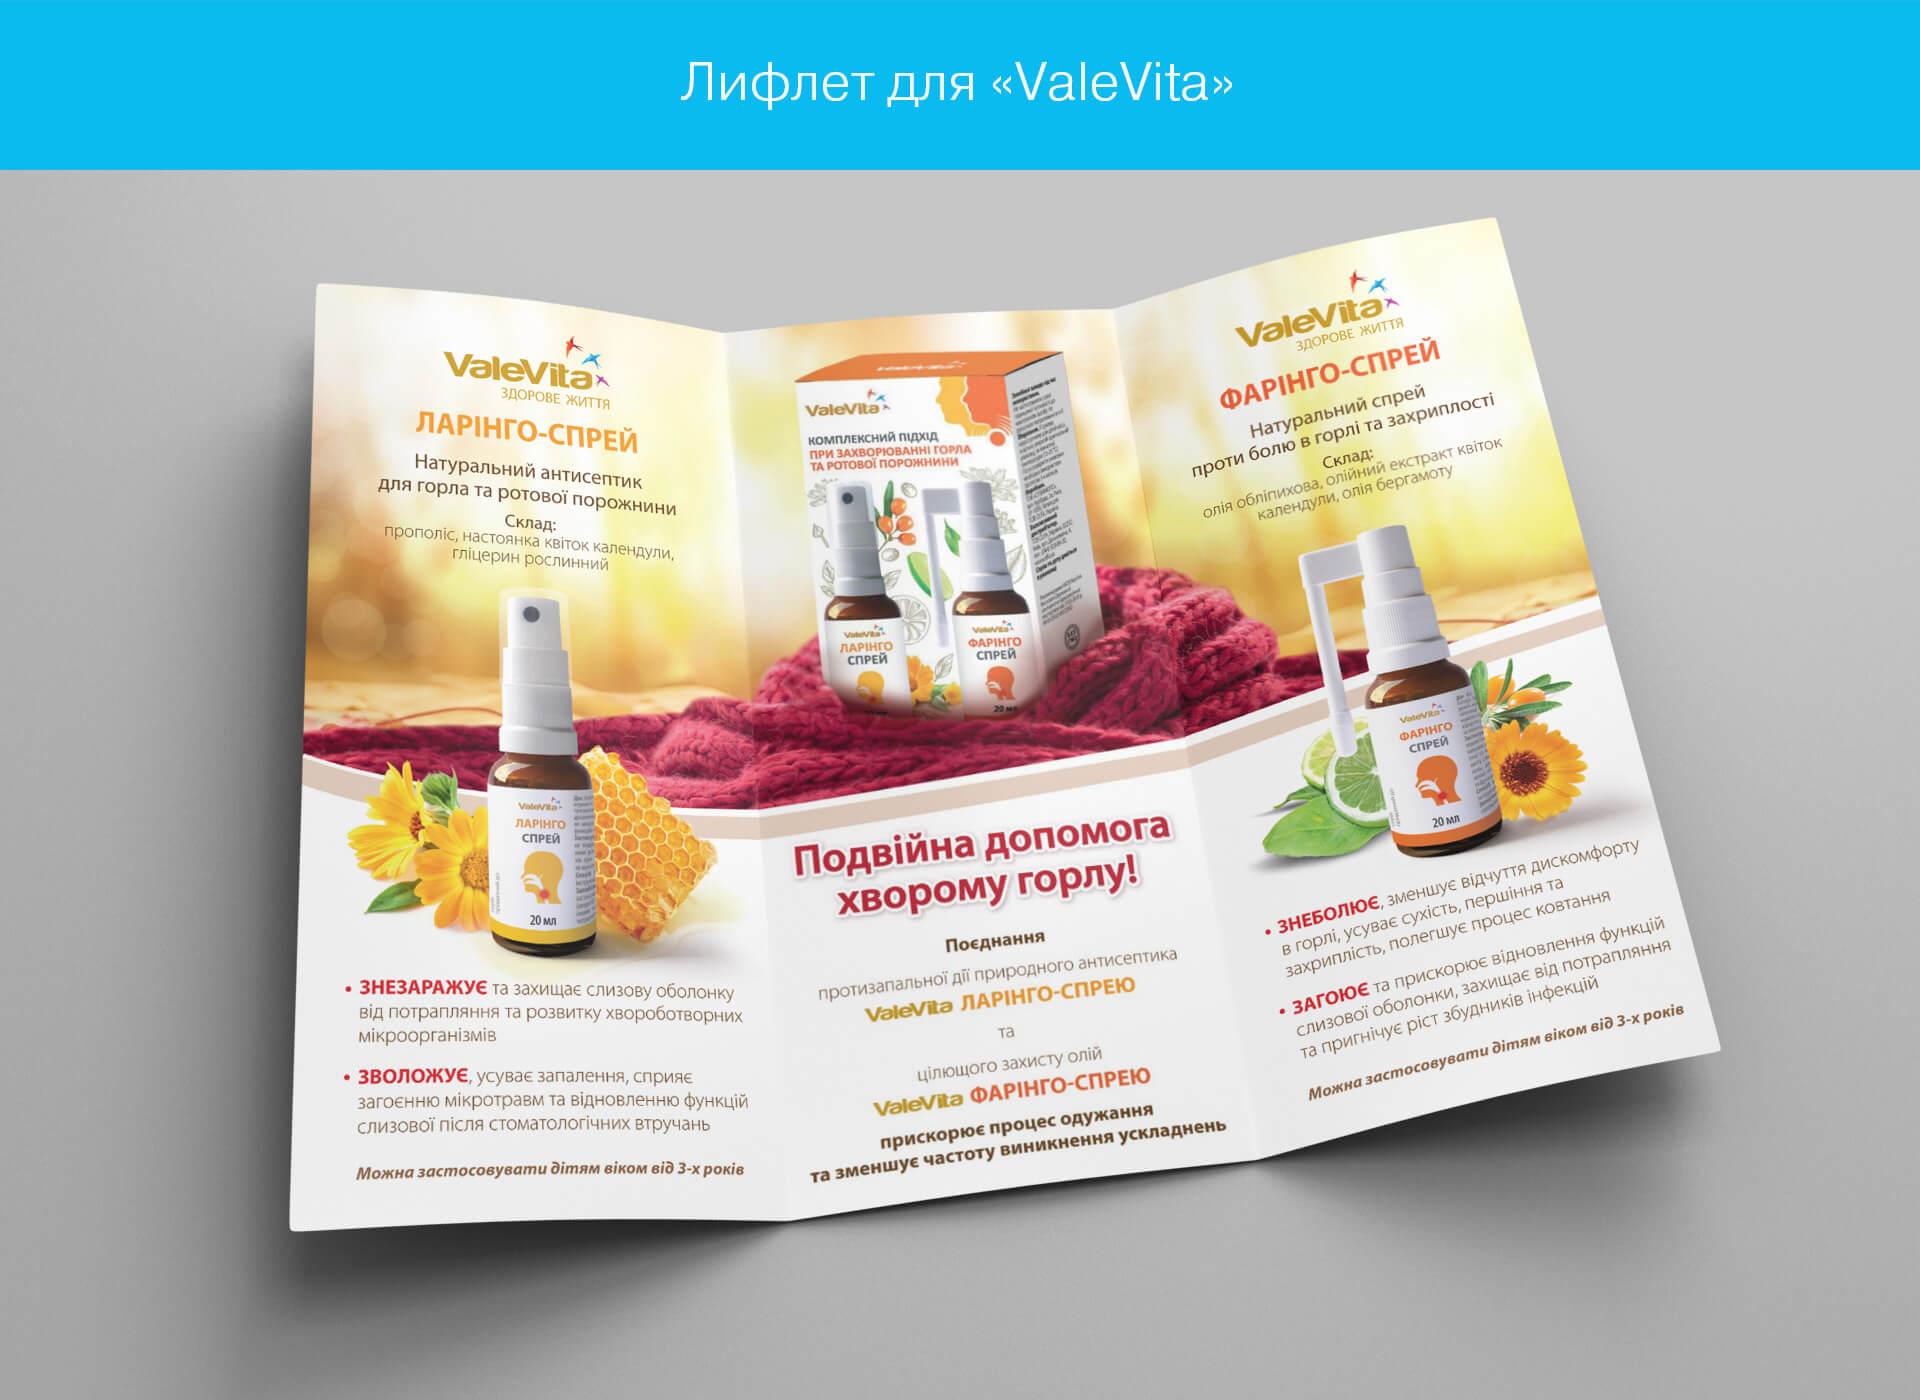 Prokochuk_Irina_ValeVita_Laringo+Faringo_leaflet_1